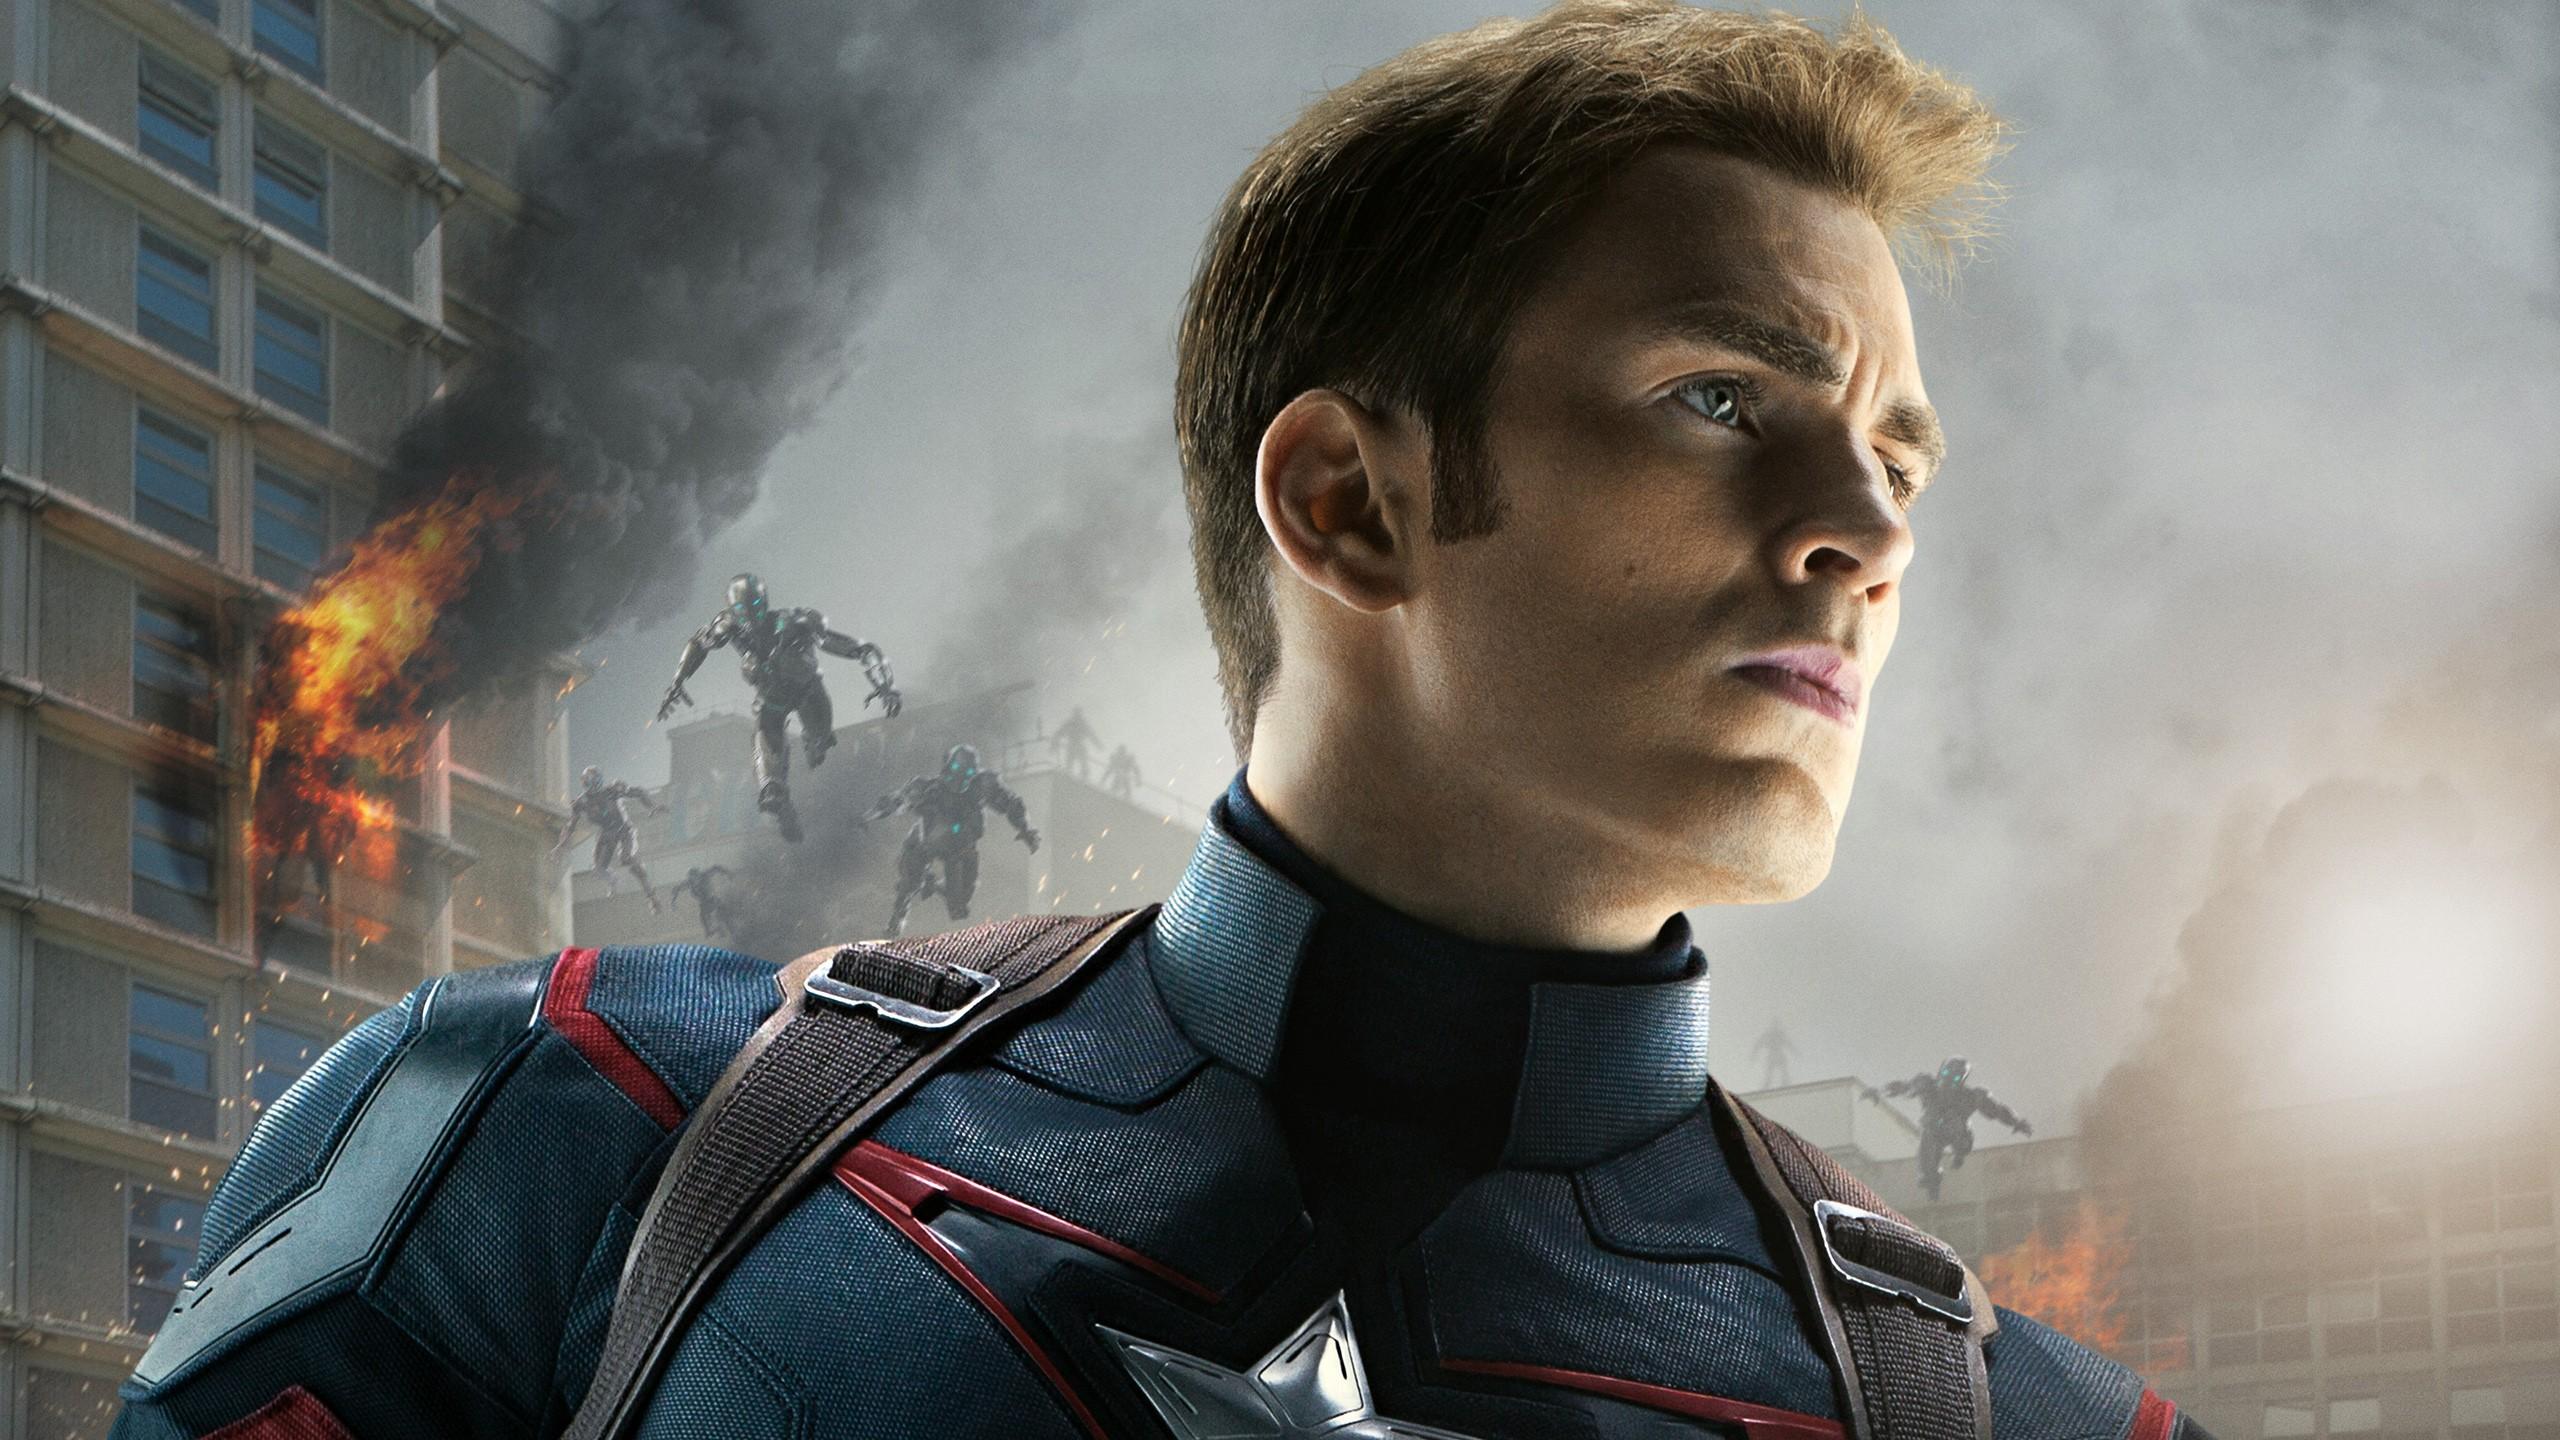 Beautiful Wallpaper Marvel Face - Captain-America-Avengers-Age-Of-Ultron-  Trends_479484.jpg